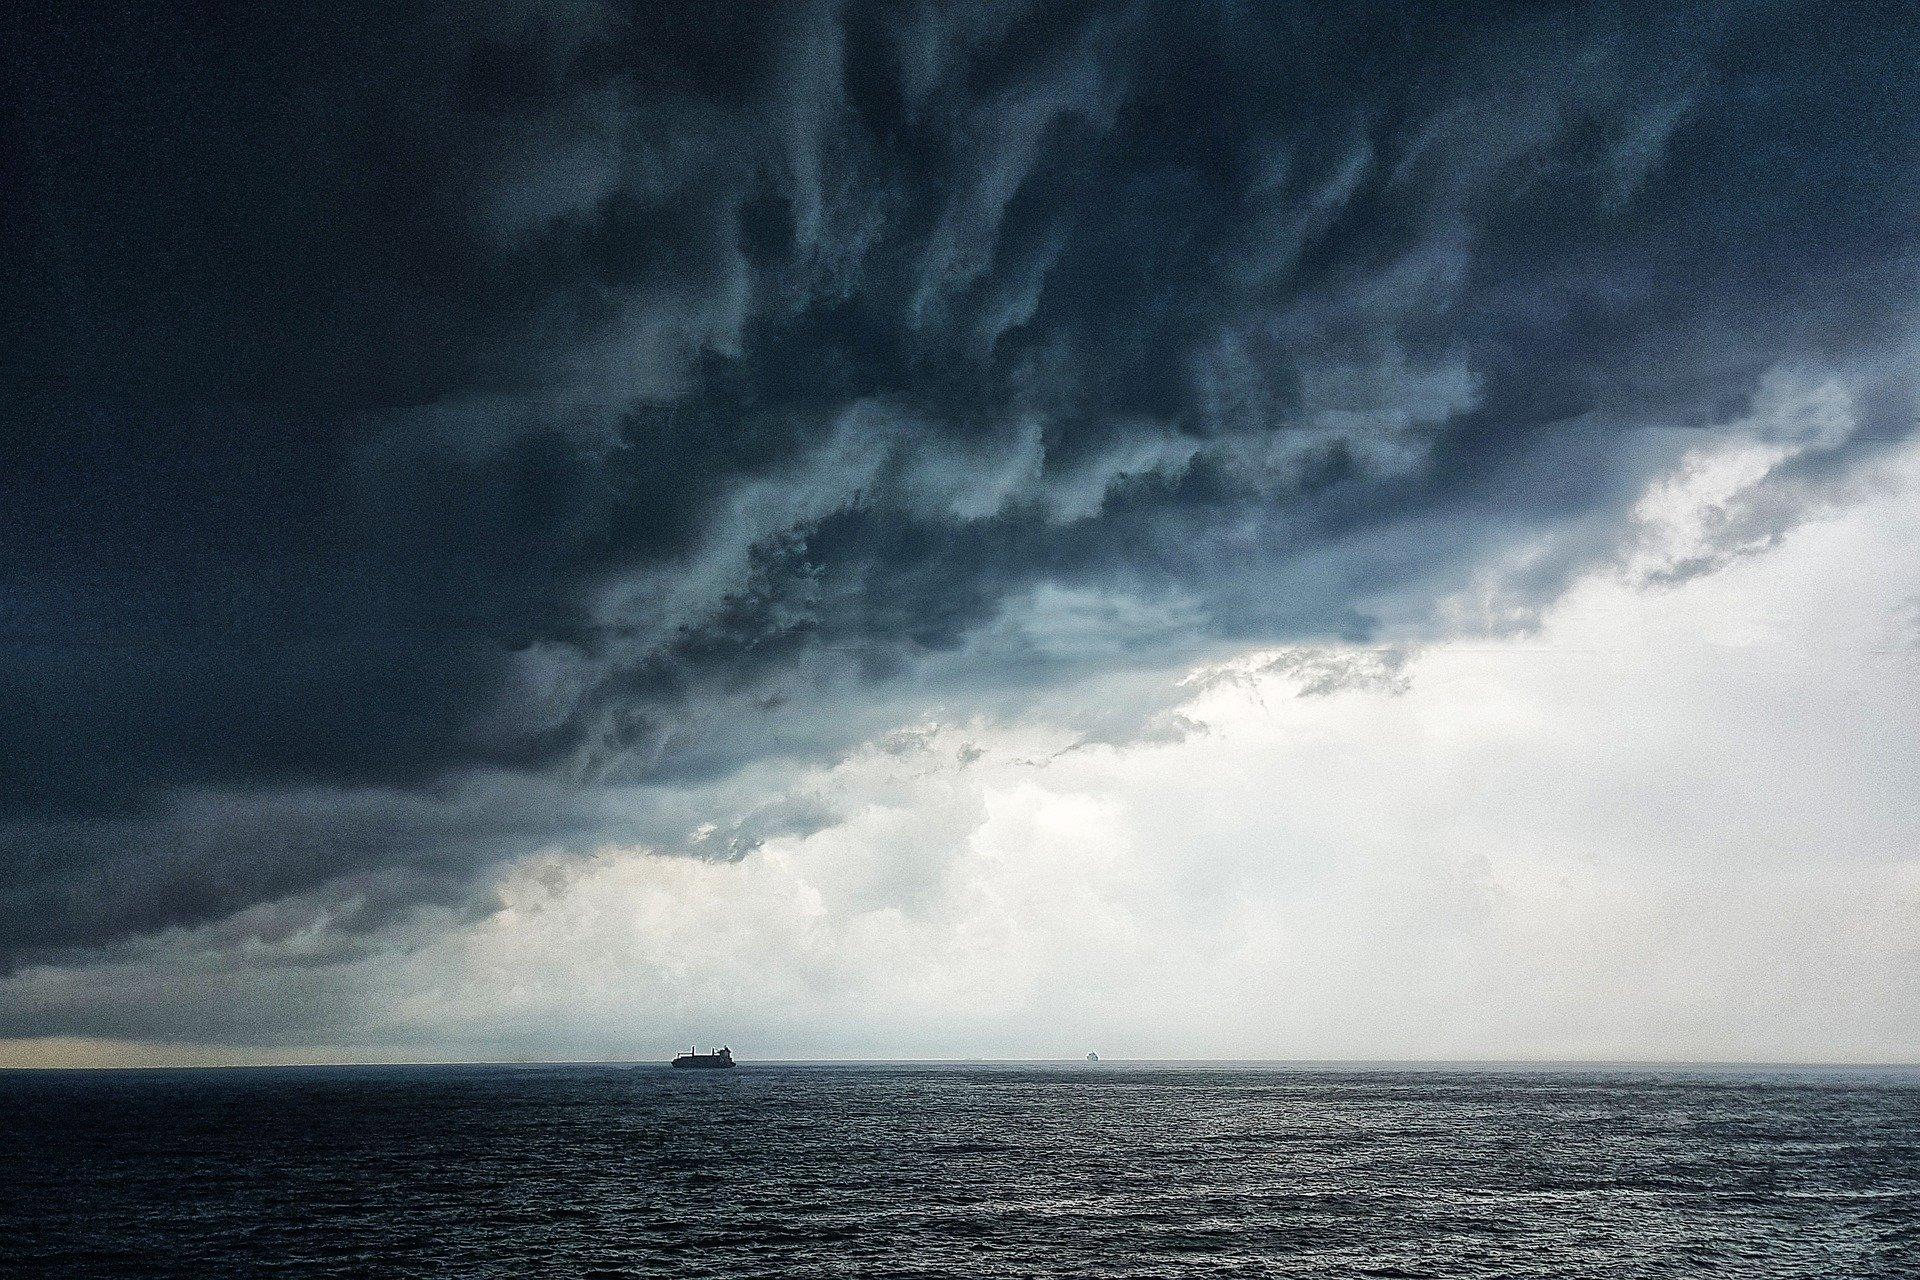 Prognoza burz na dzień 25.06.2020 i noc 25/26.06.2020